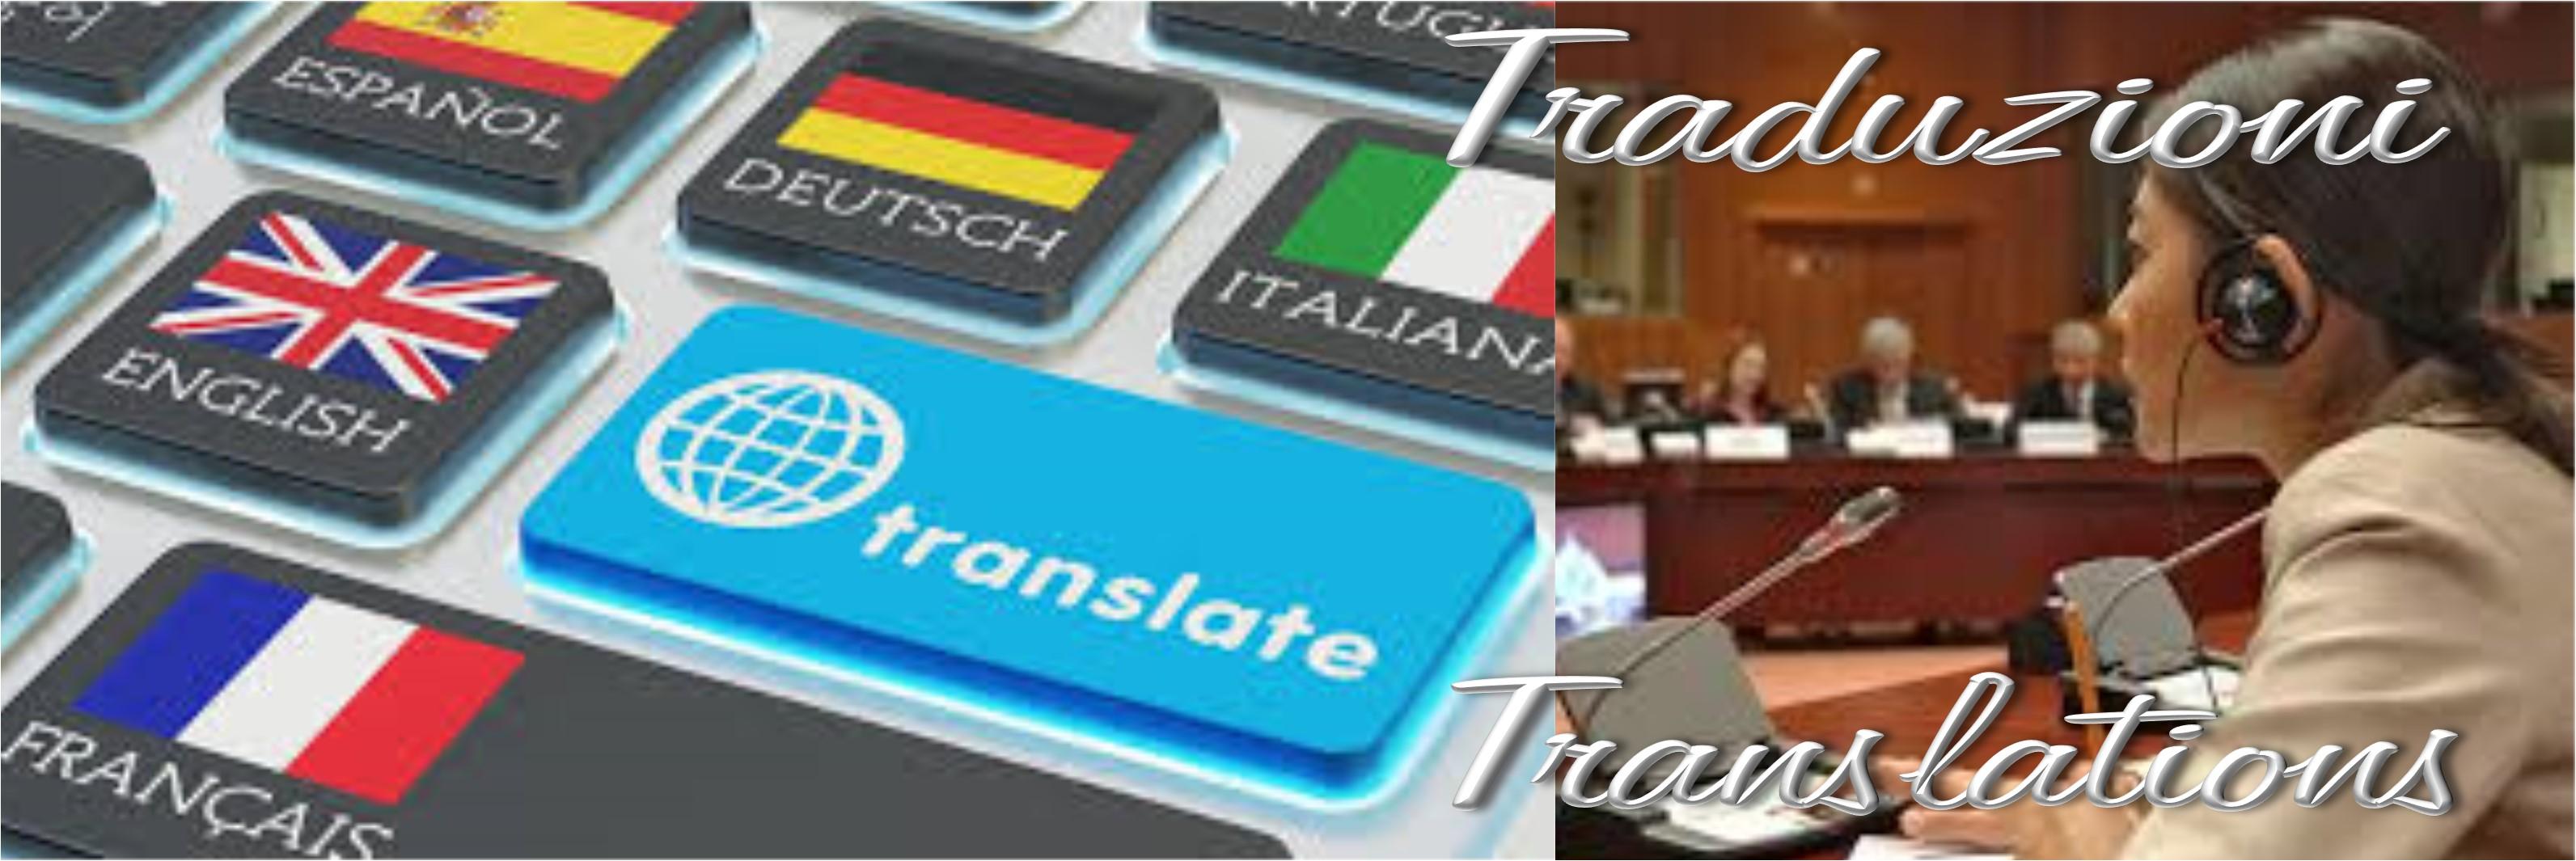 Traduzioni, Translations